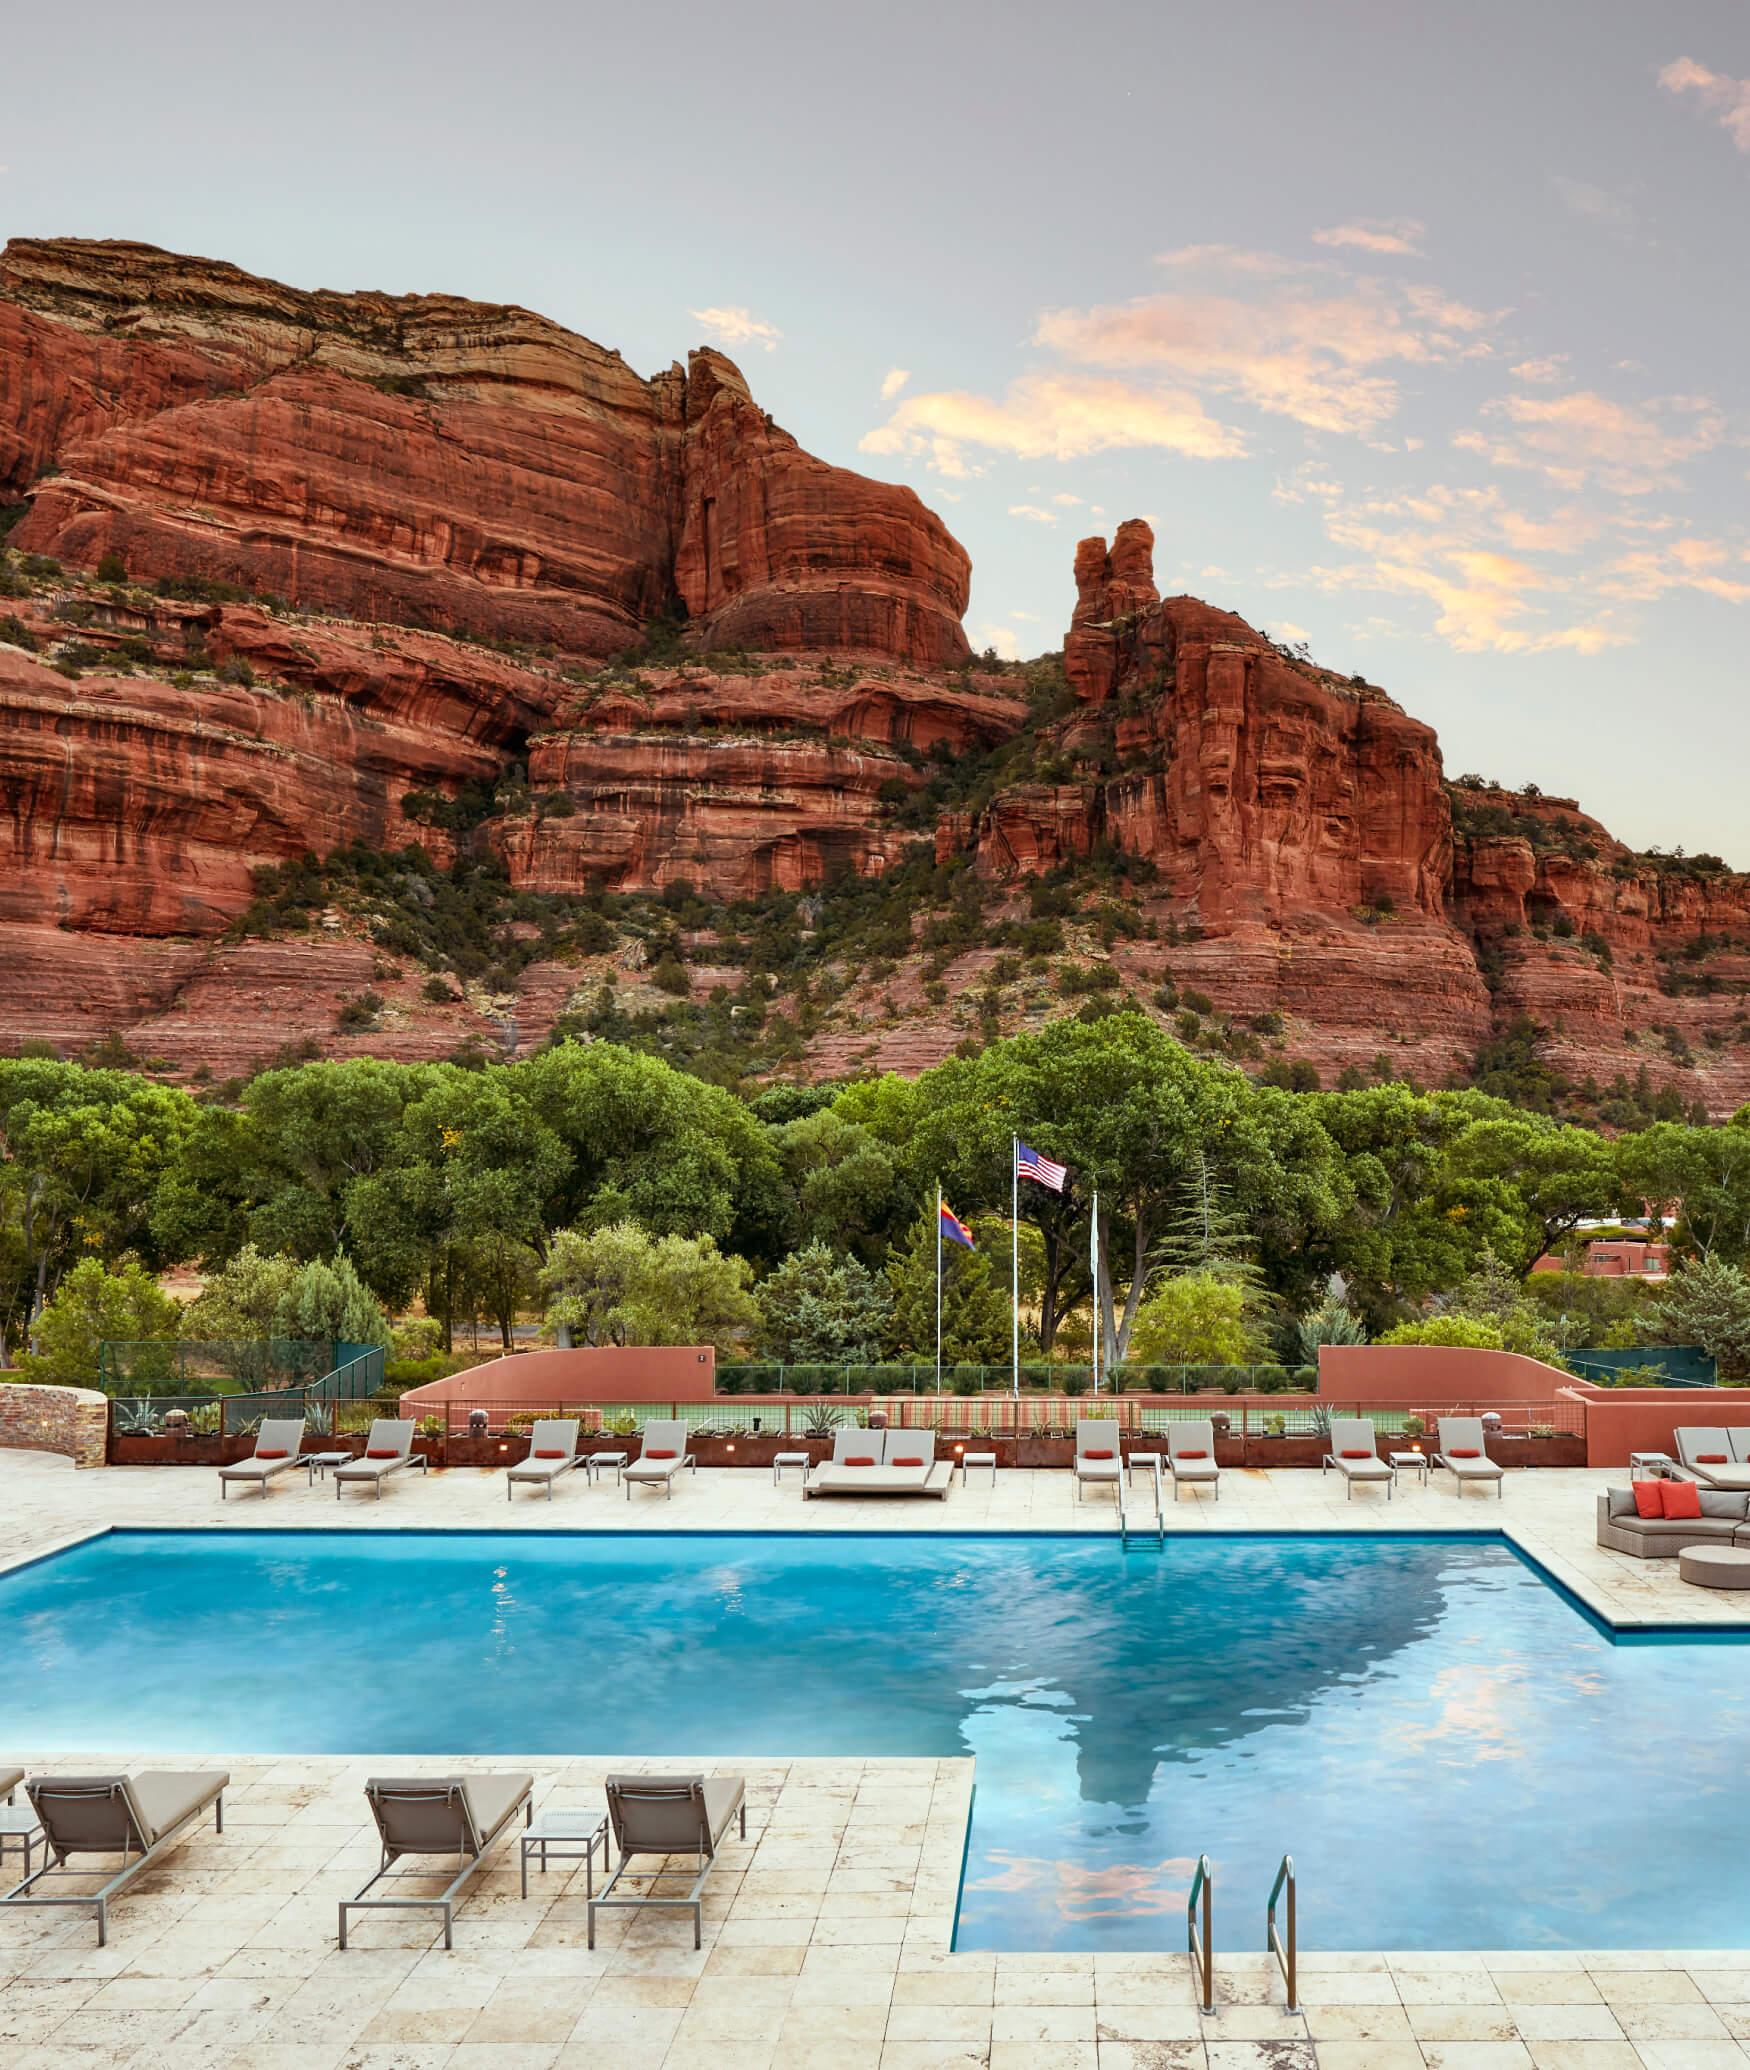 Enchantment Resort Pool